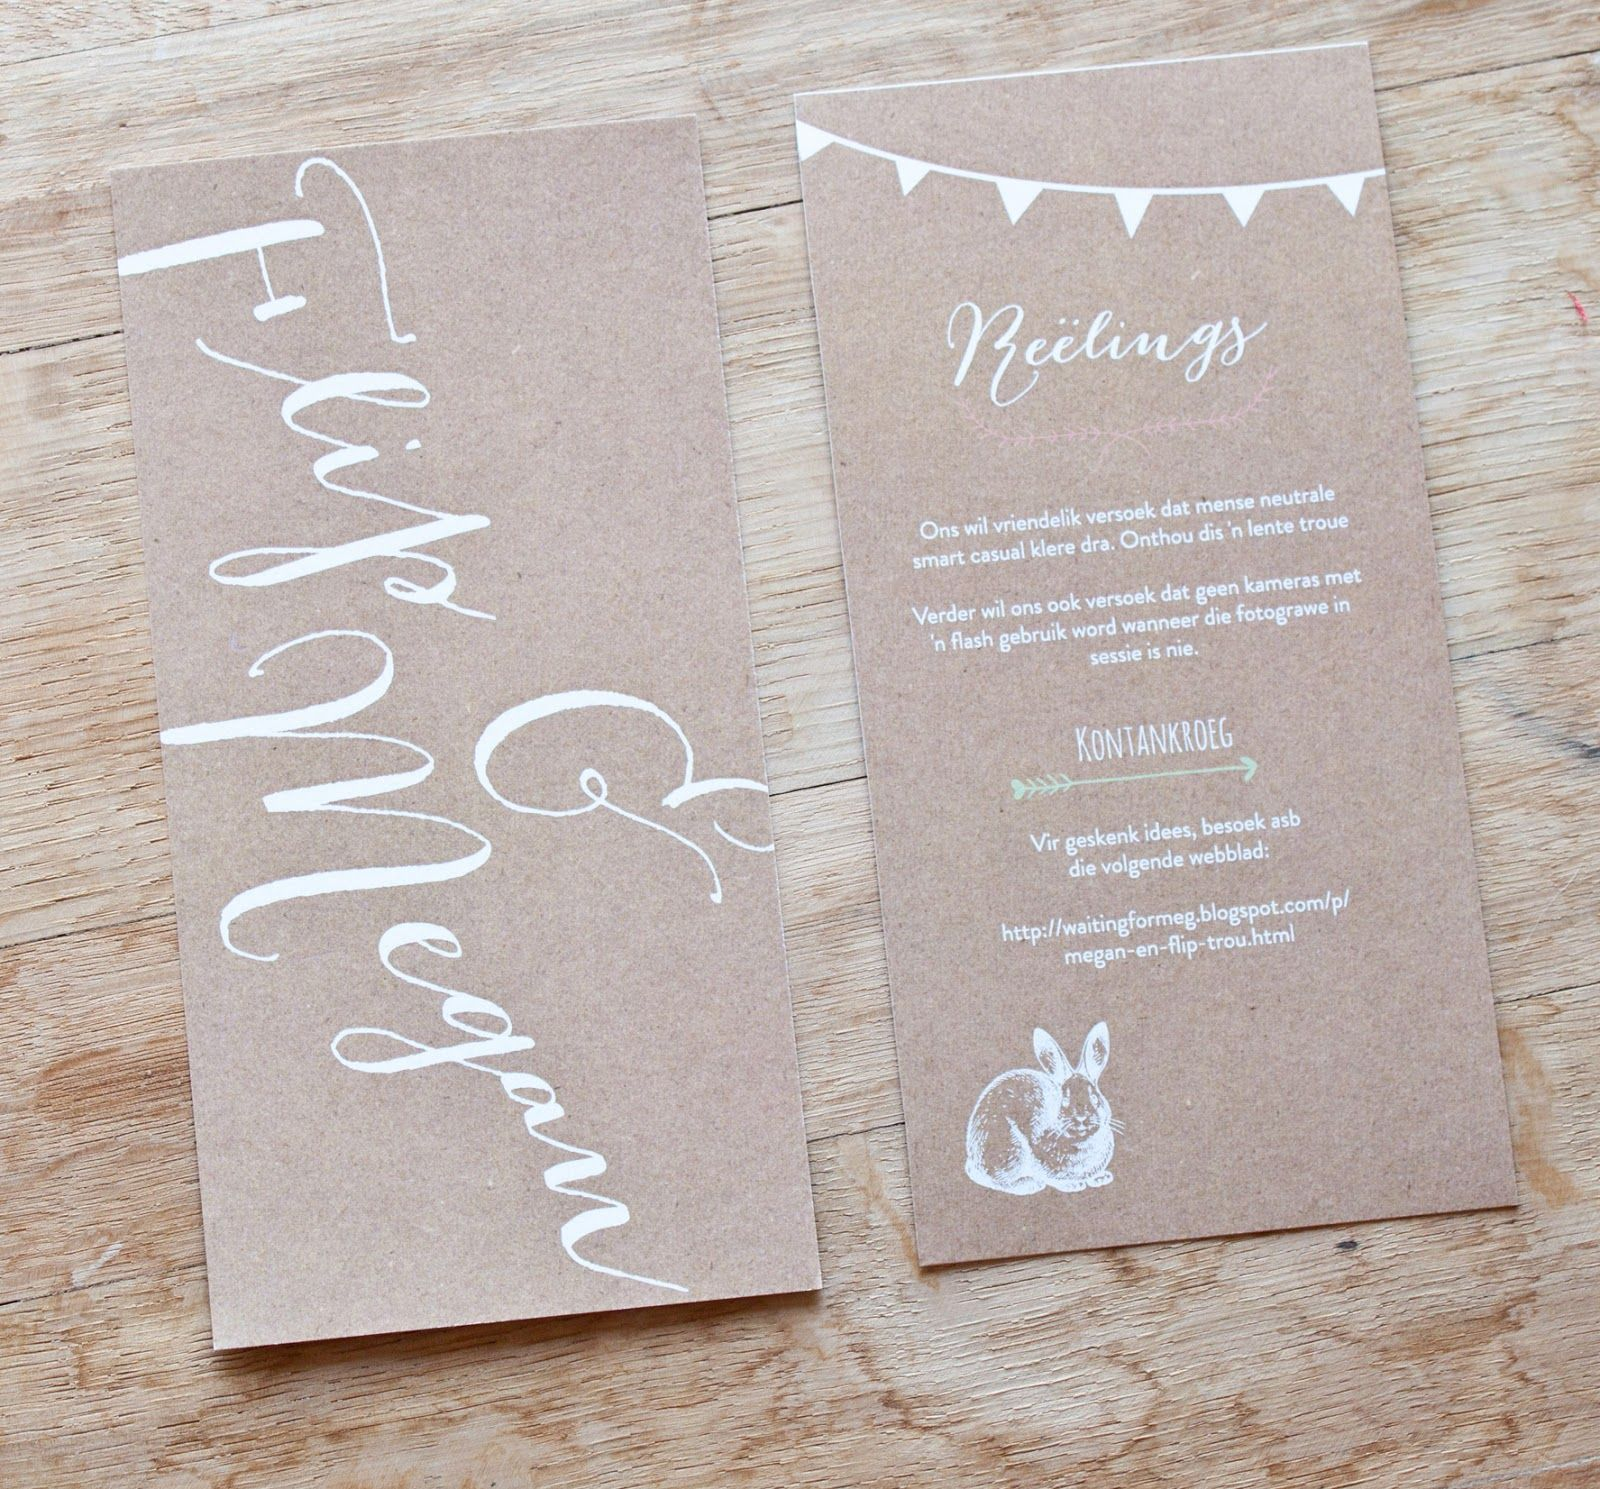 Kraft paper rustic wedding invites by Susan Brand